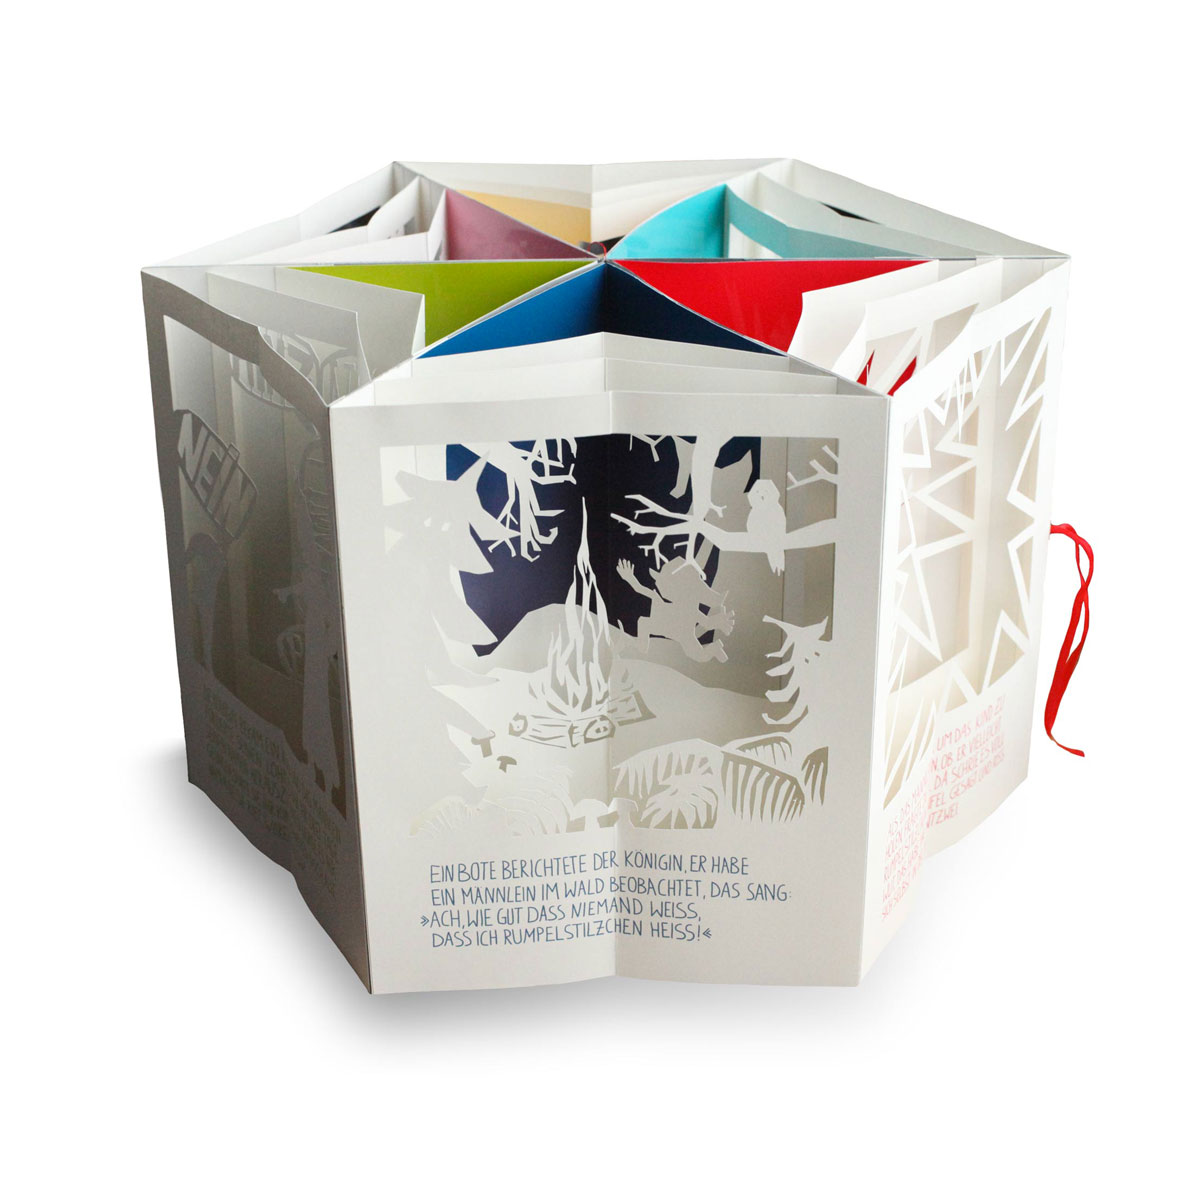 Die Cut Book Cover Design : Felicitas horstschäfer graphic design illustration